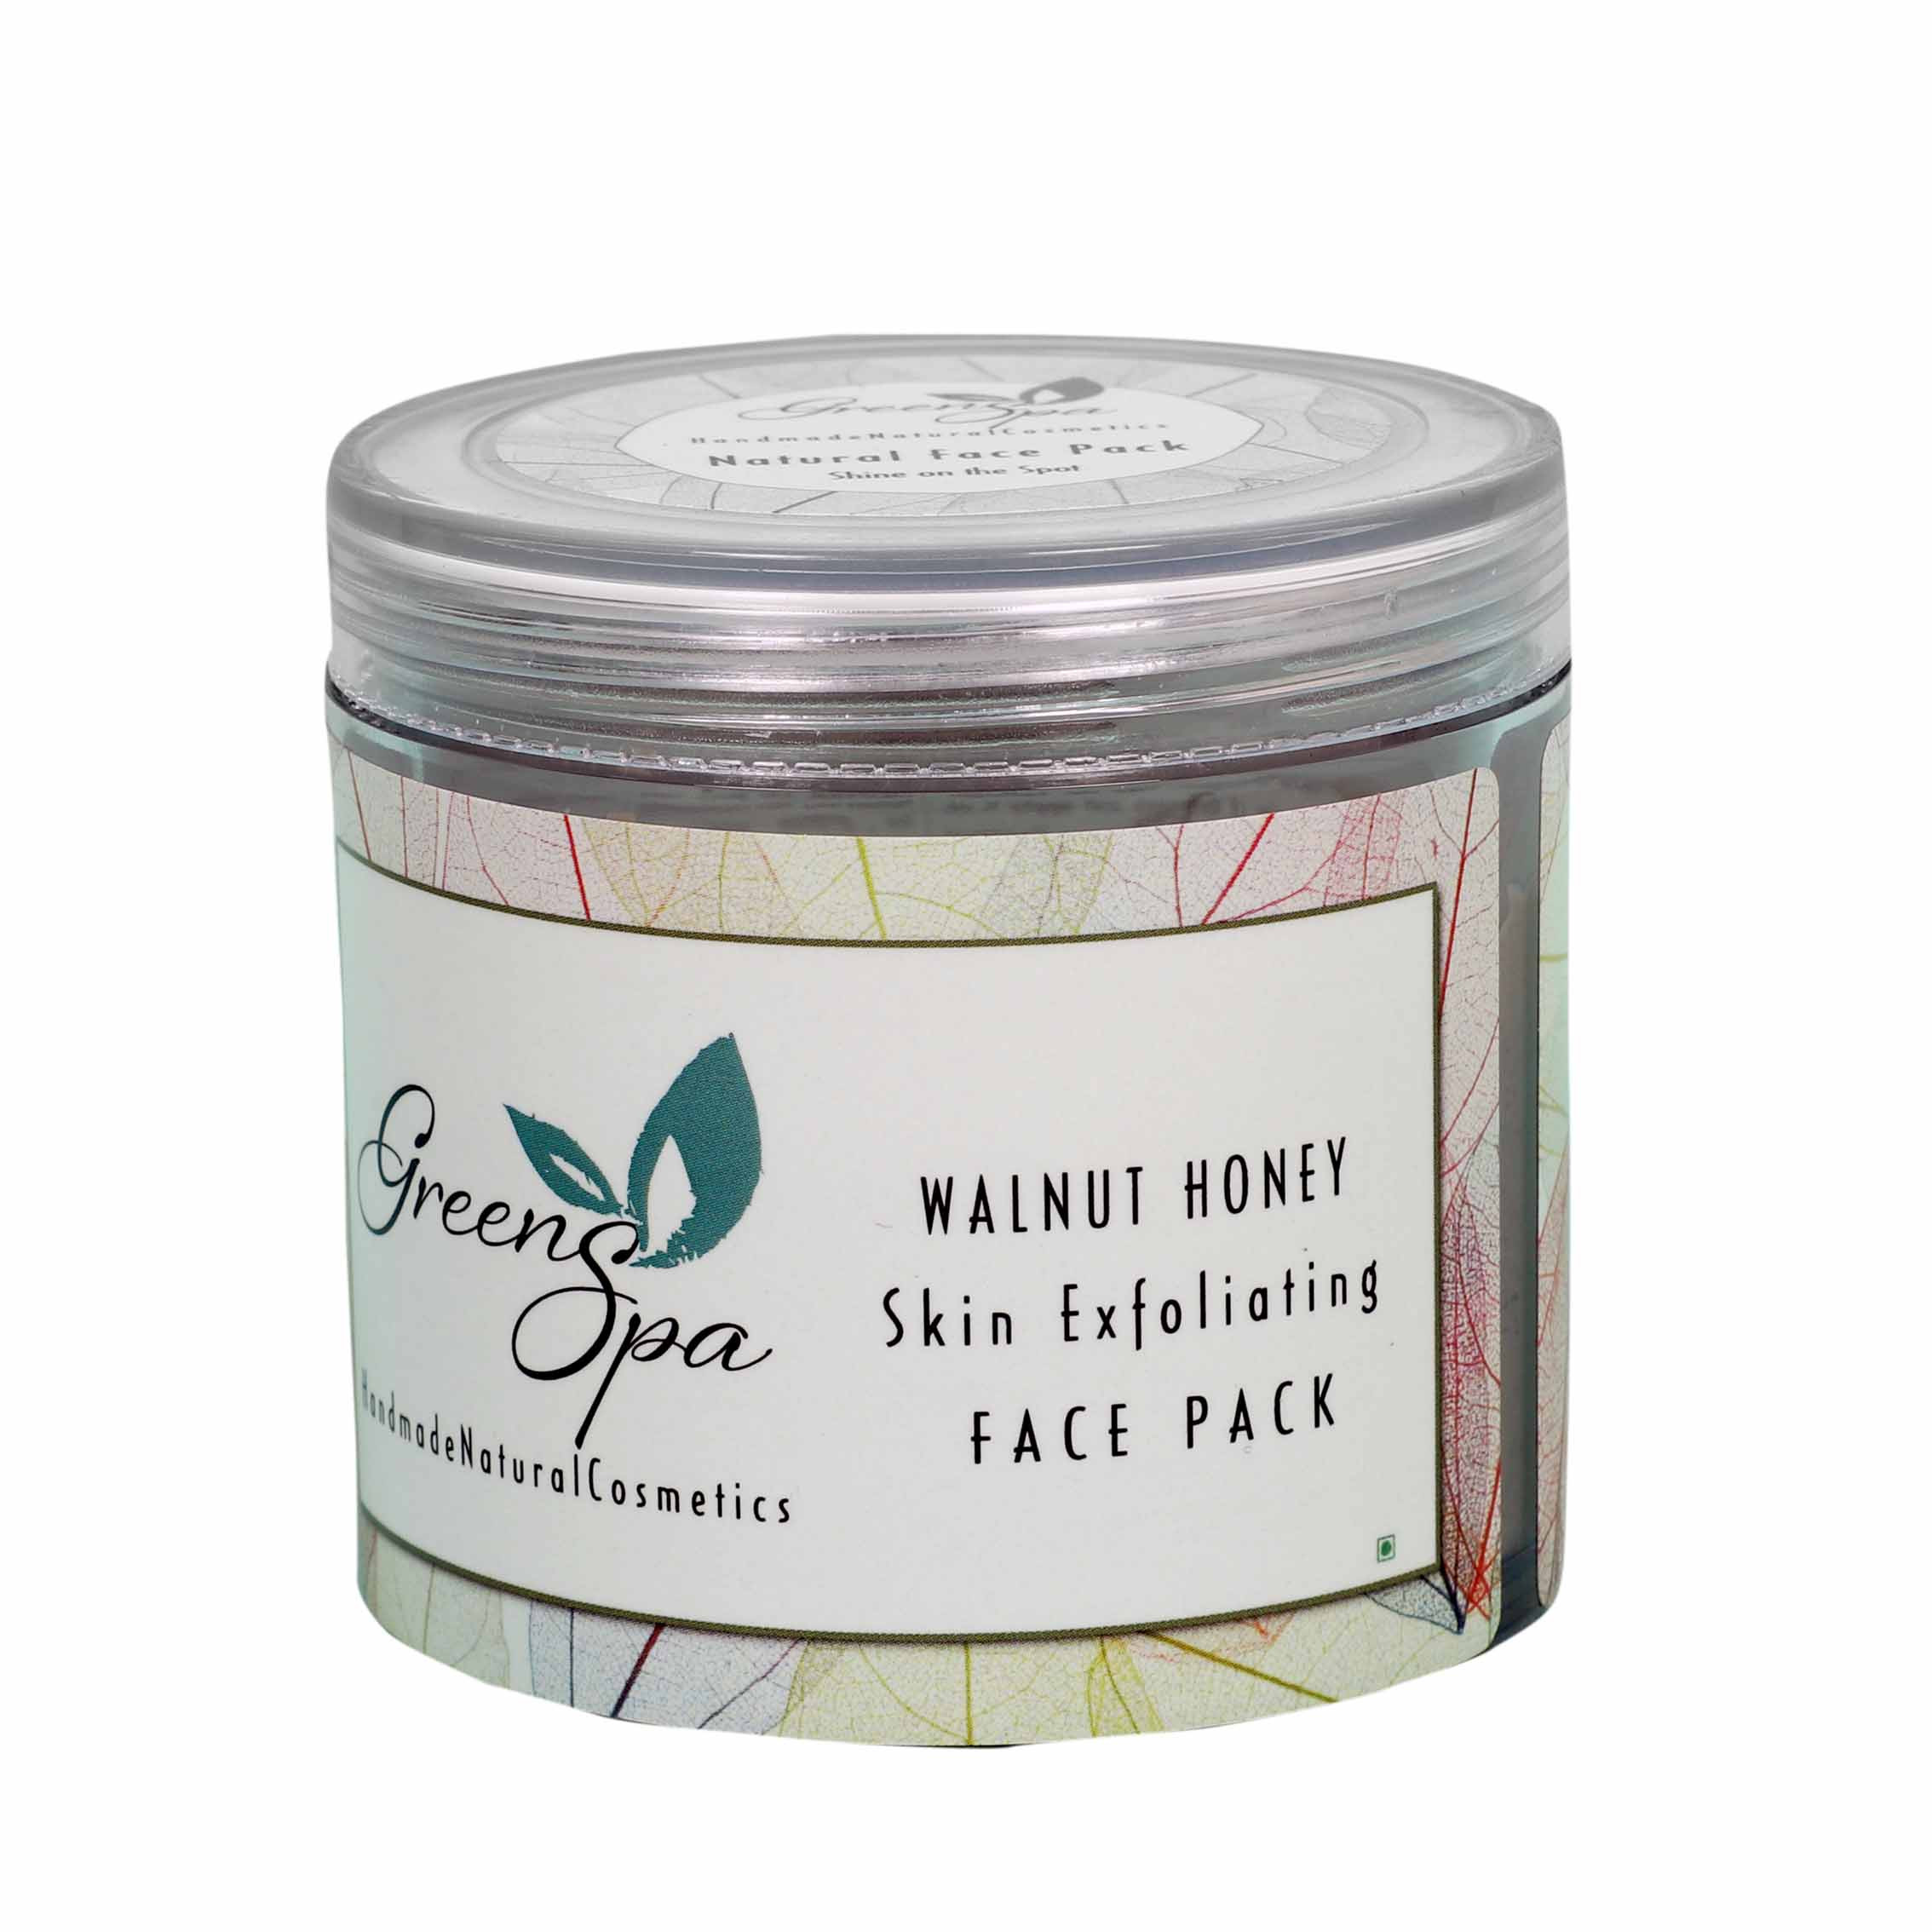 Greenspa Wallnut Honey Skin Exfoliating Facepack 100gm